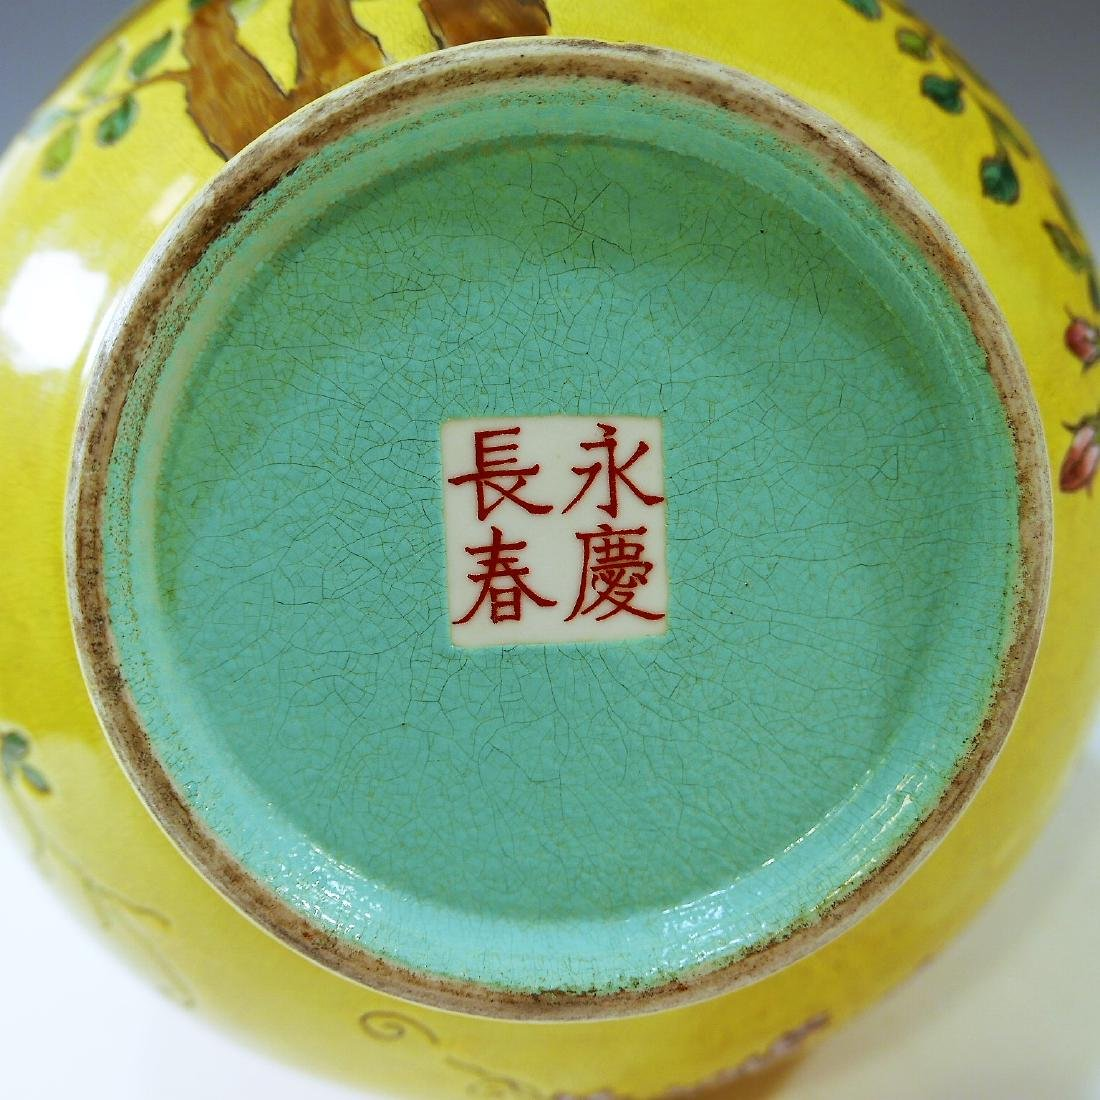 CHINESE ANTIQUE FAMILLE ROSE PORCELAIN VASE - DAYAZHAI - 3